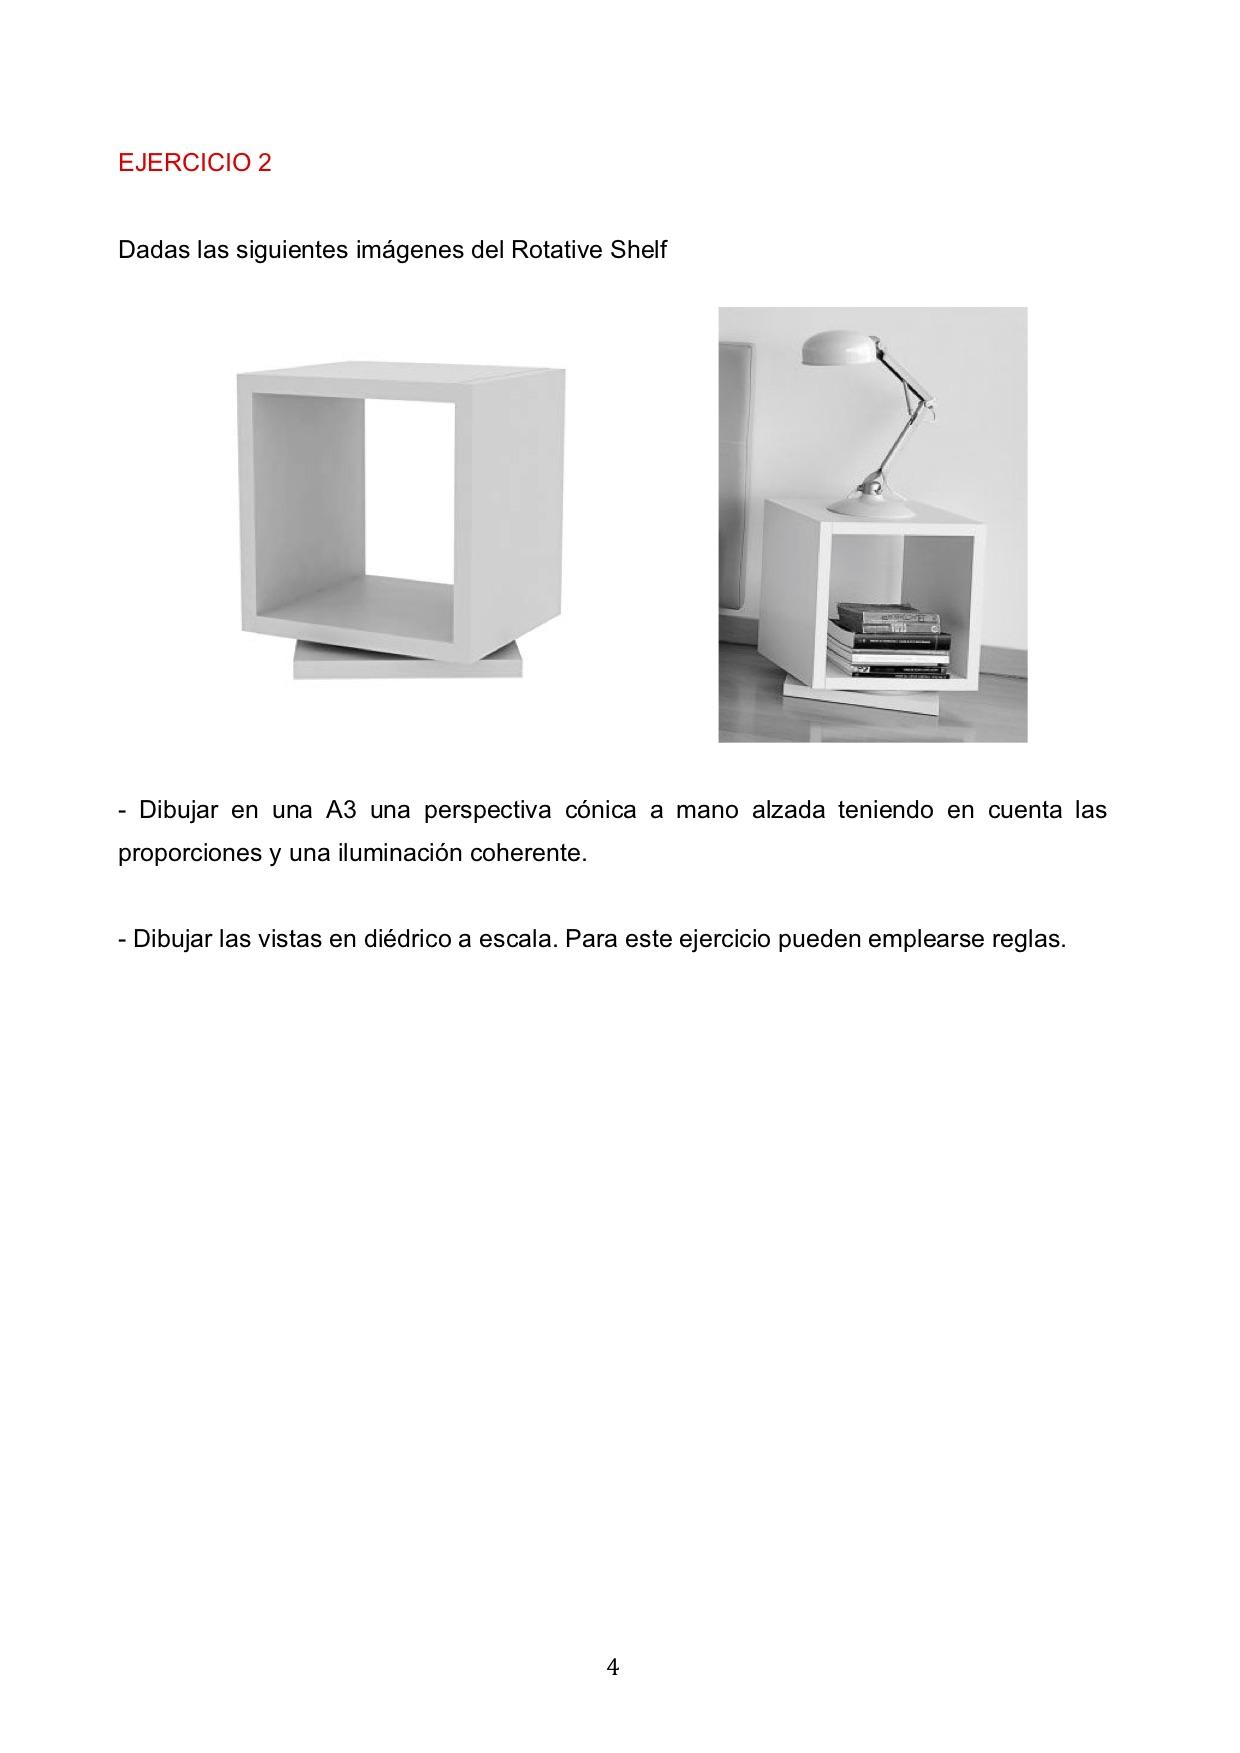 Modelo-prueba-Estudios-Superiores-de-diseño.-Llotja-2019-4